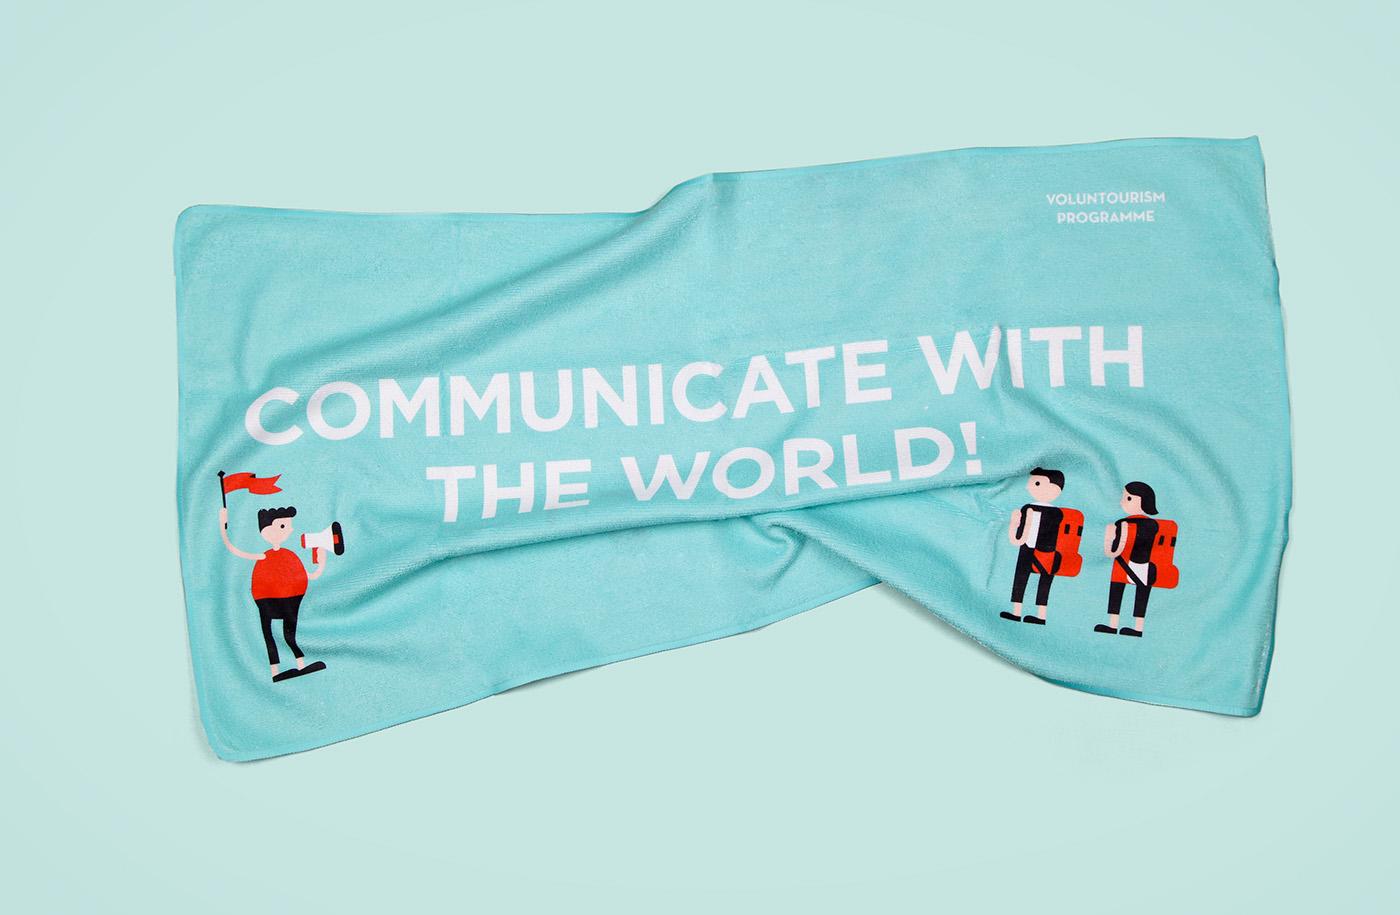 voluntourism Macao workcamp branding  Illustrator graphic design product poster untitledlab